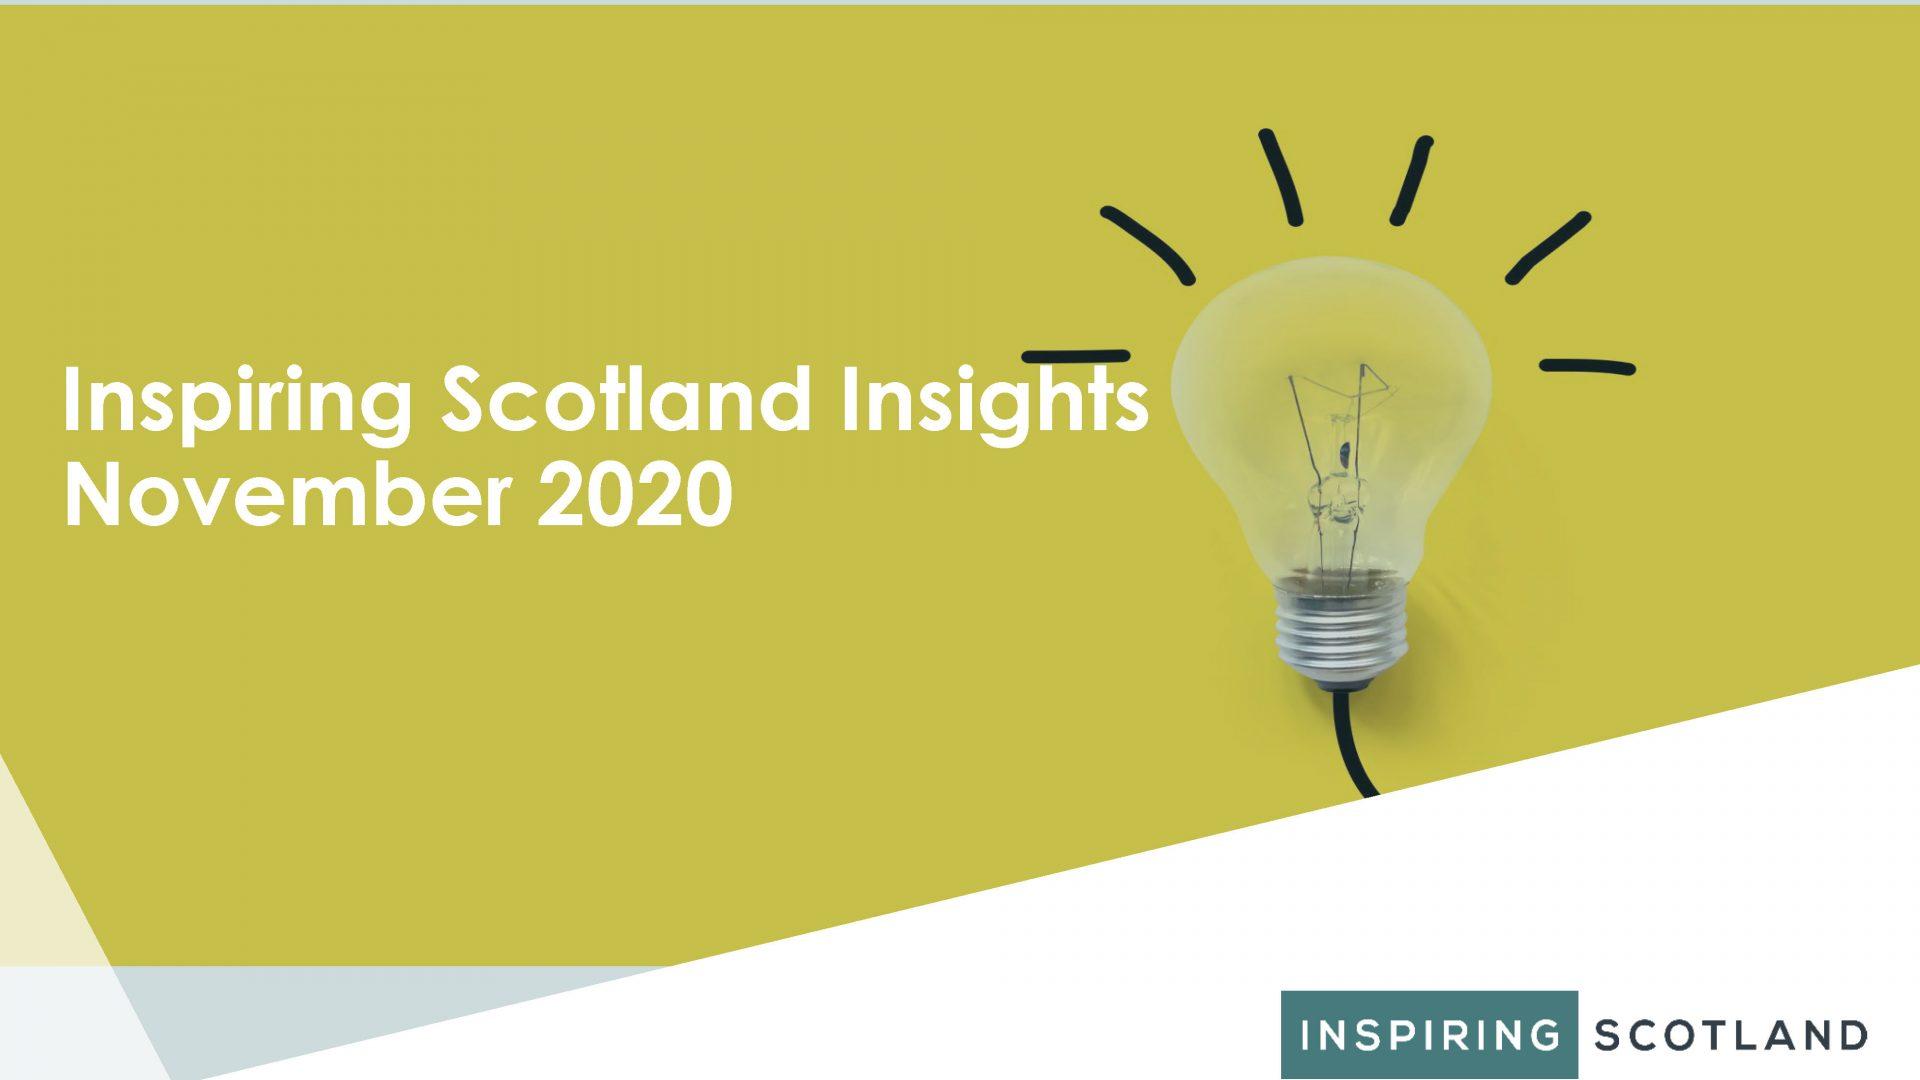 Inspiring Scotland Insights November 2020